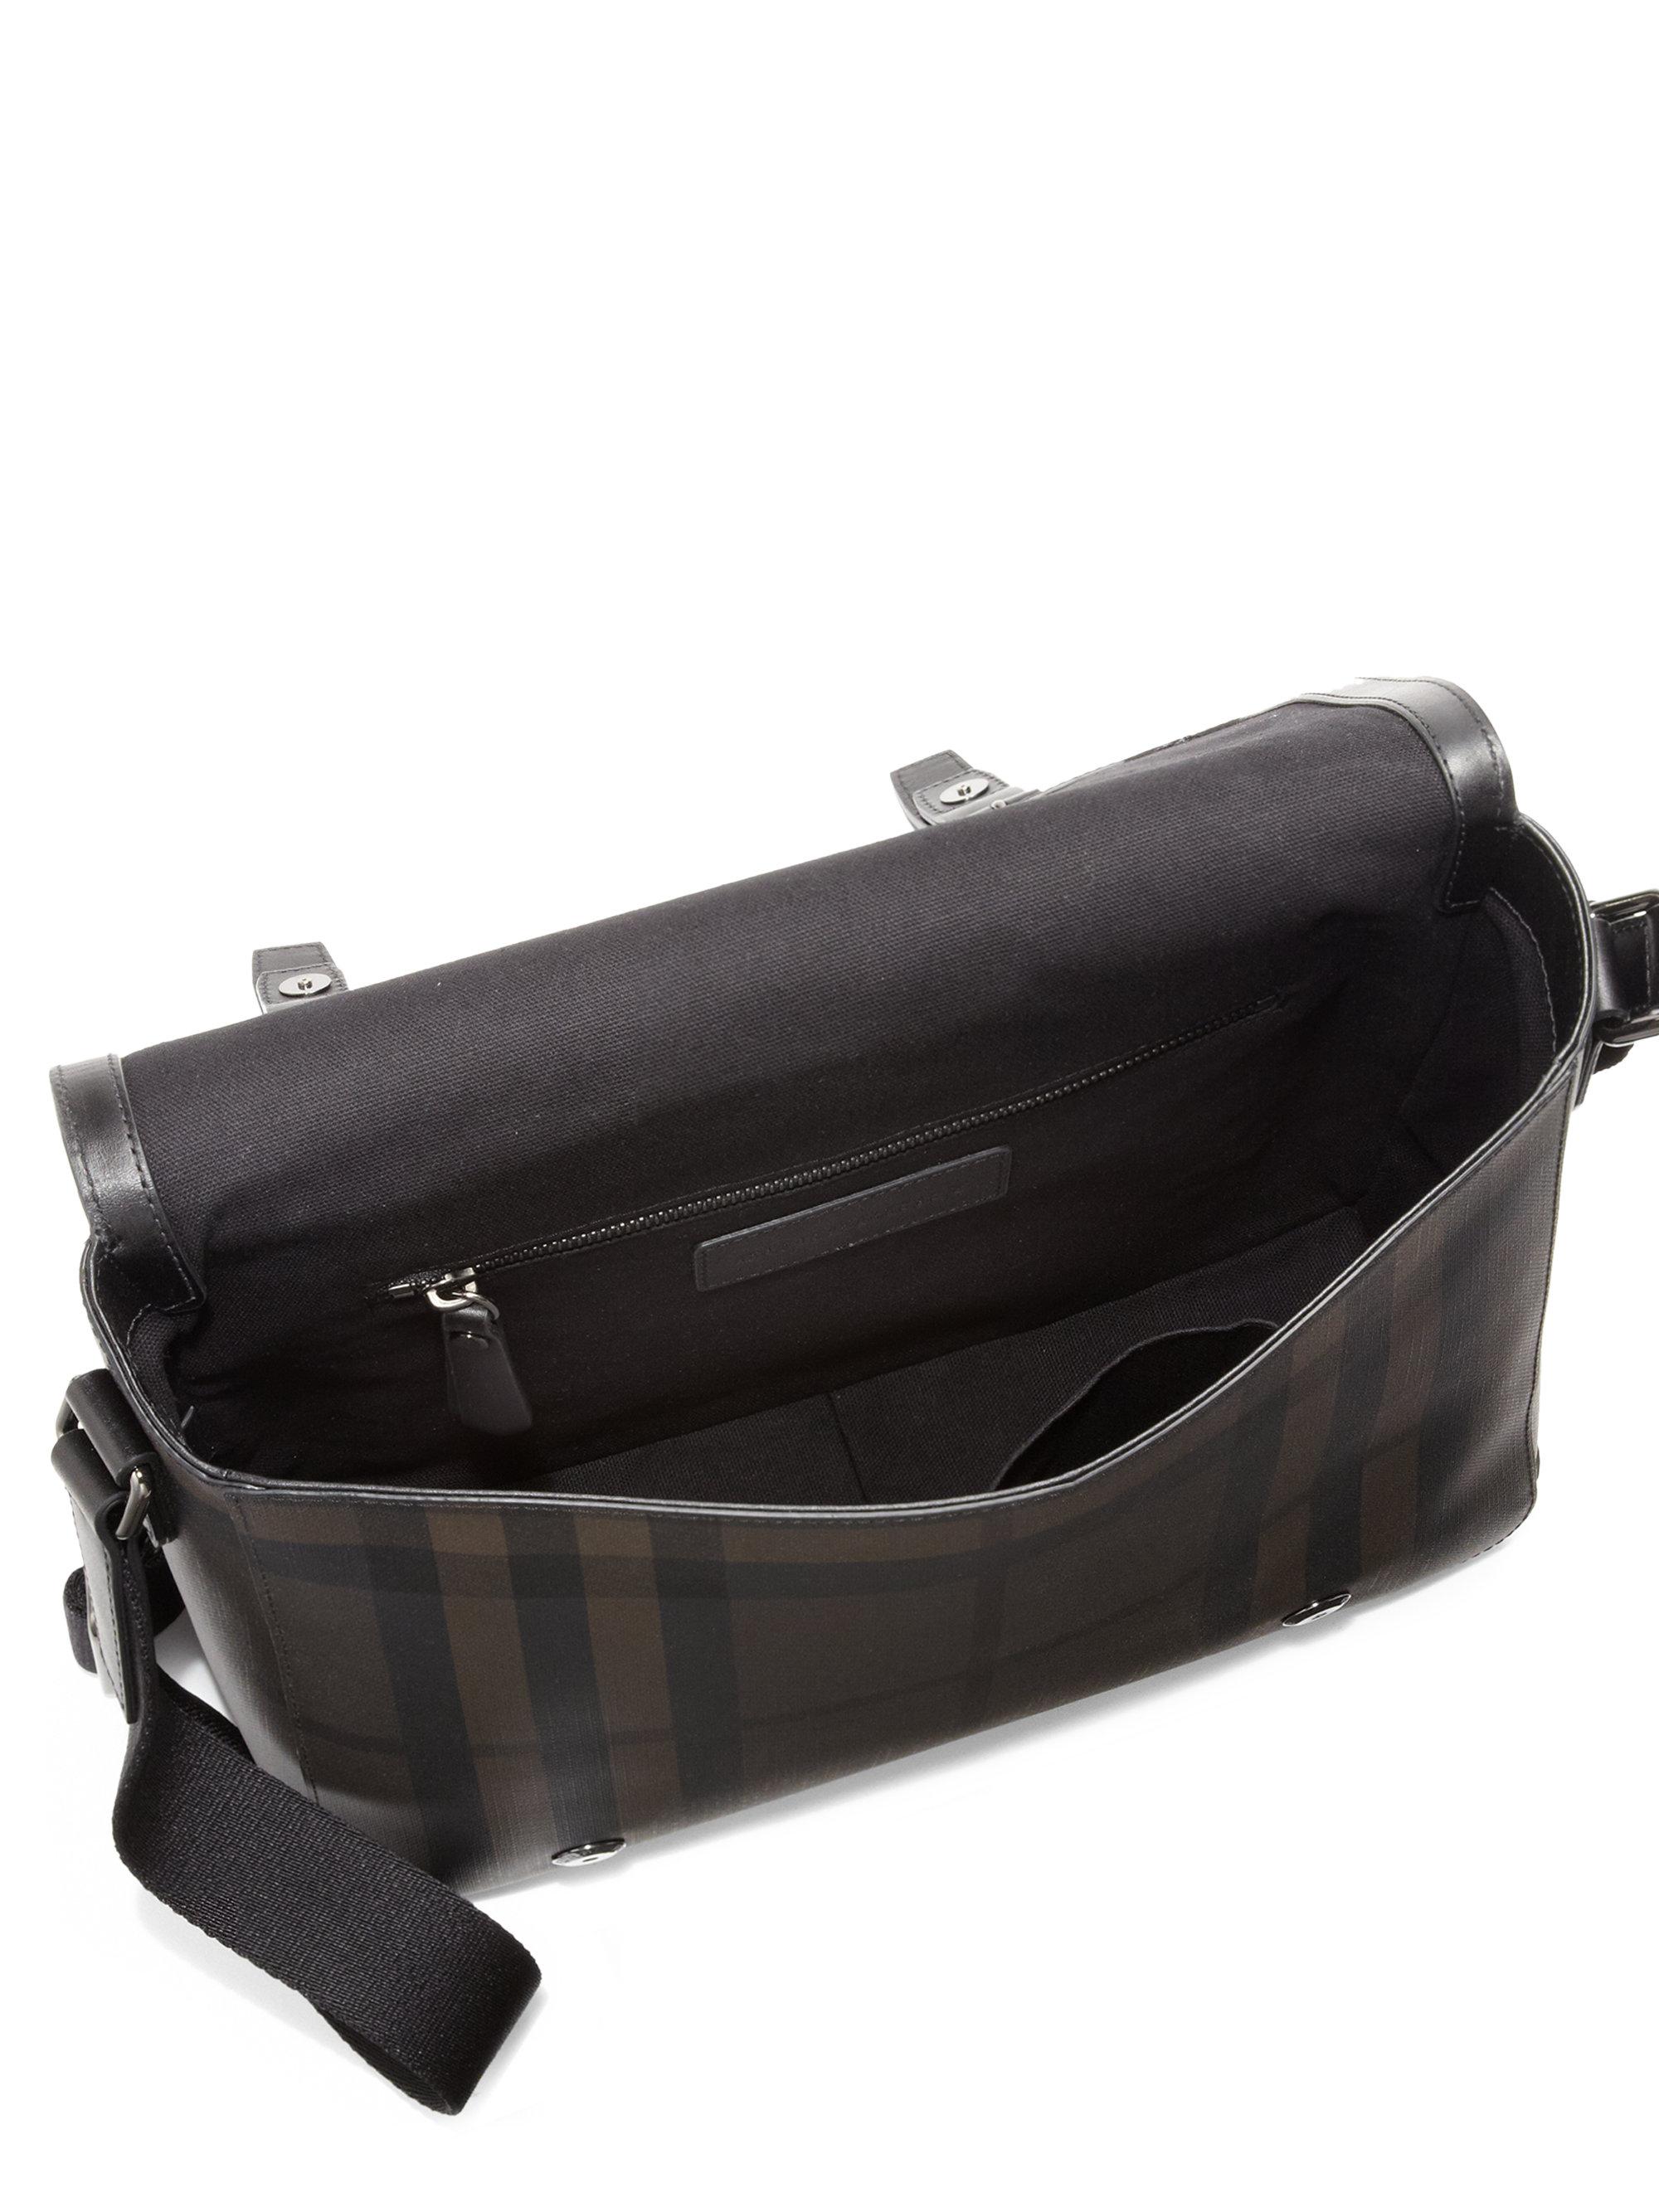 6adea9f1bb77 Lyst - Burberry Smoke Check Messenger Bag in Black for Men